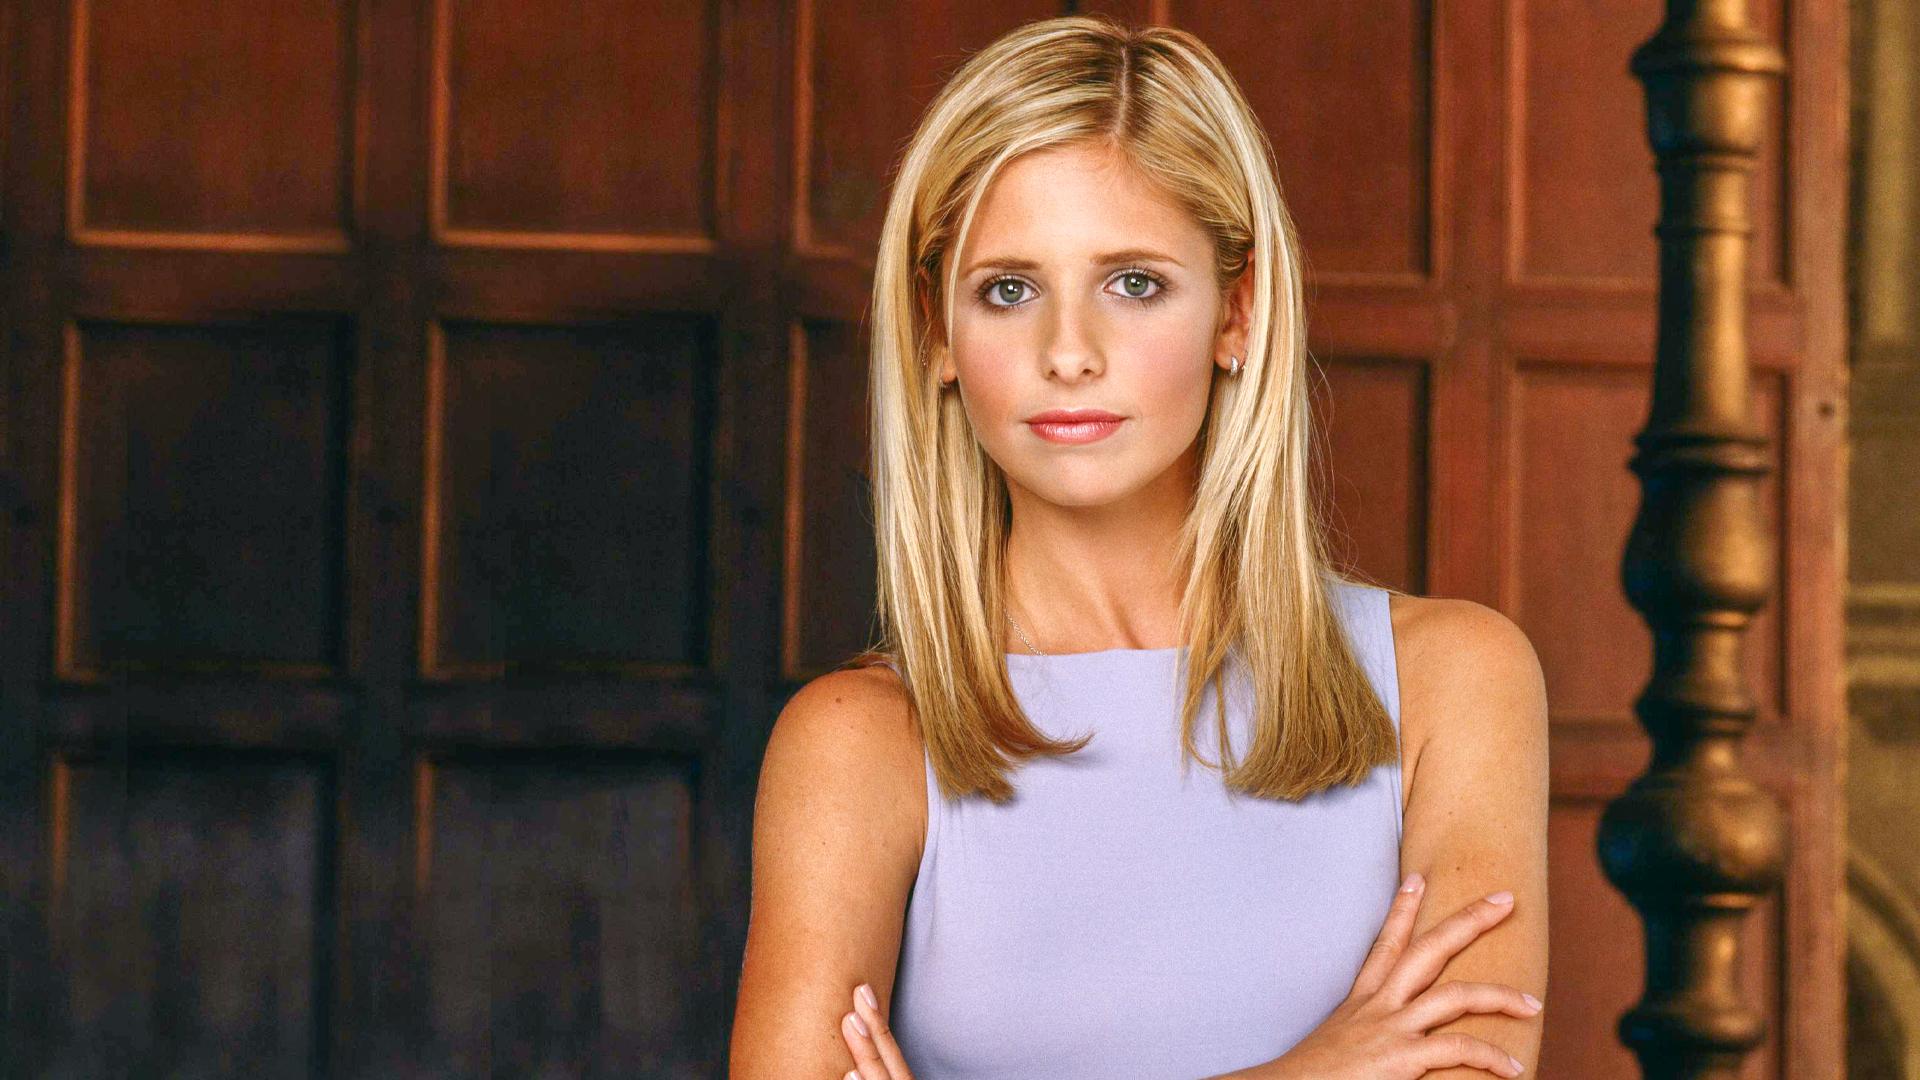 Buffy in Buffy the Vampire Slayer